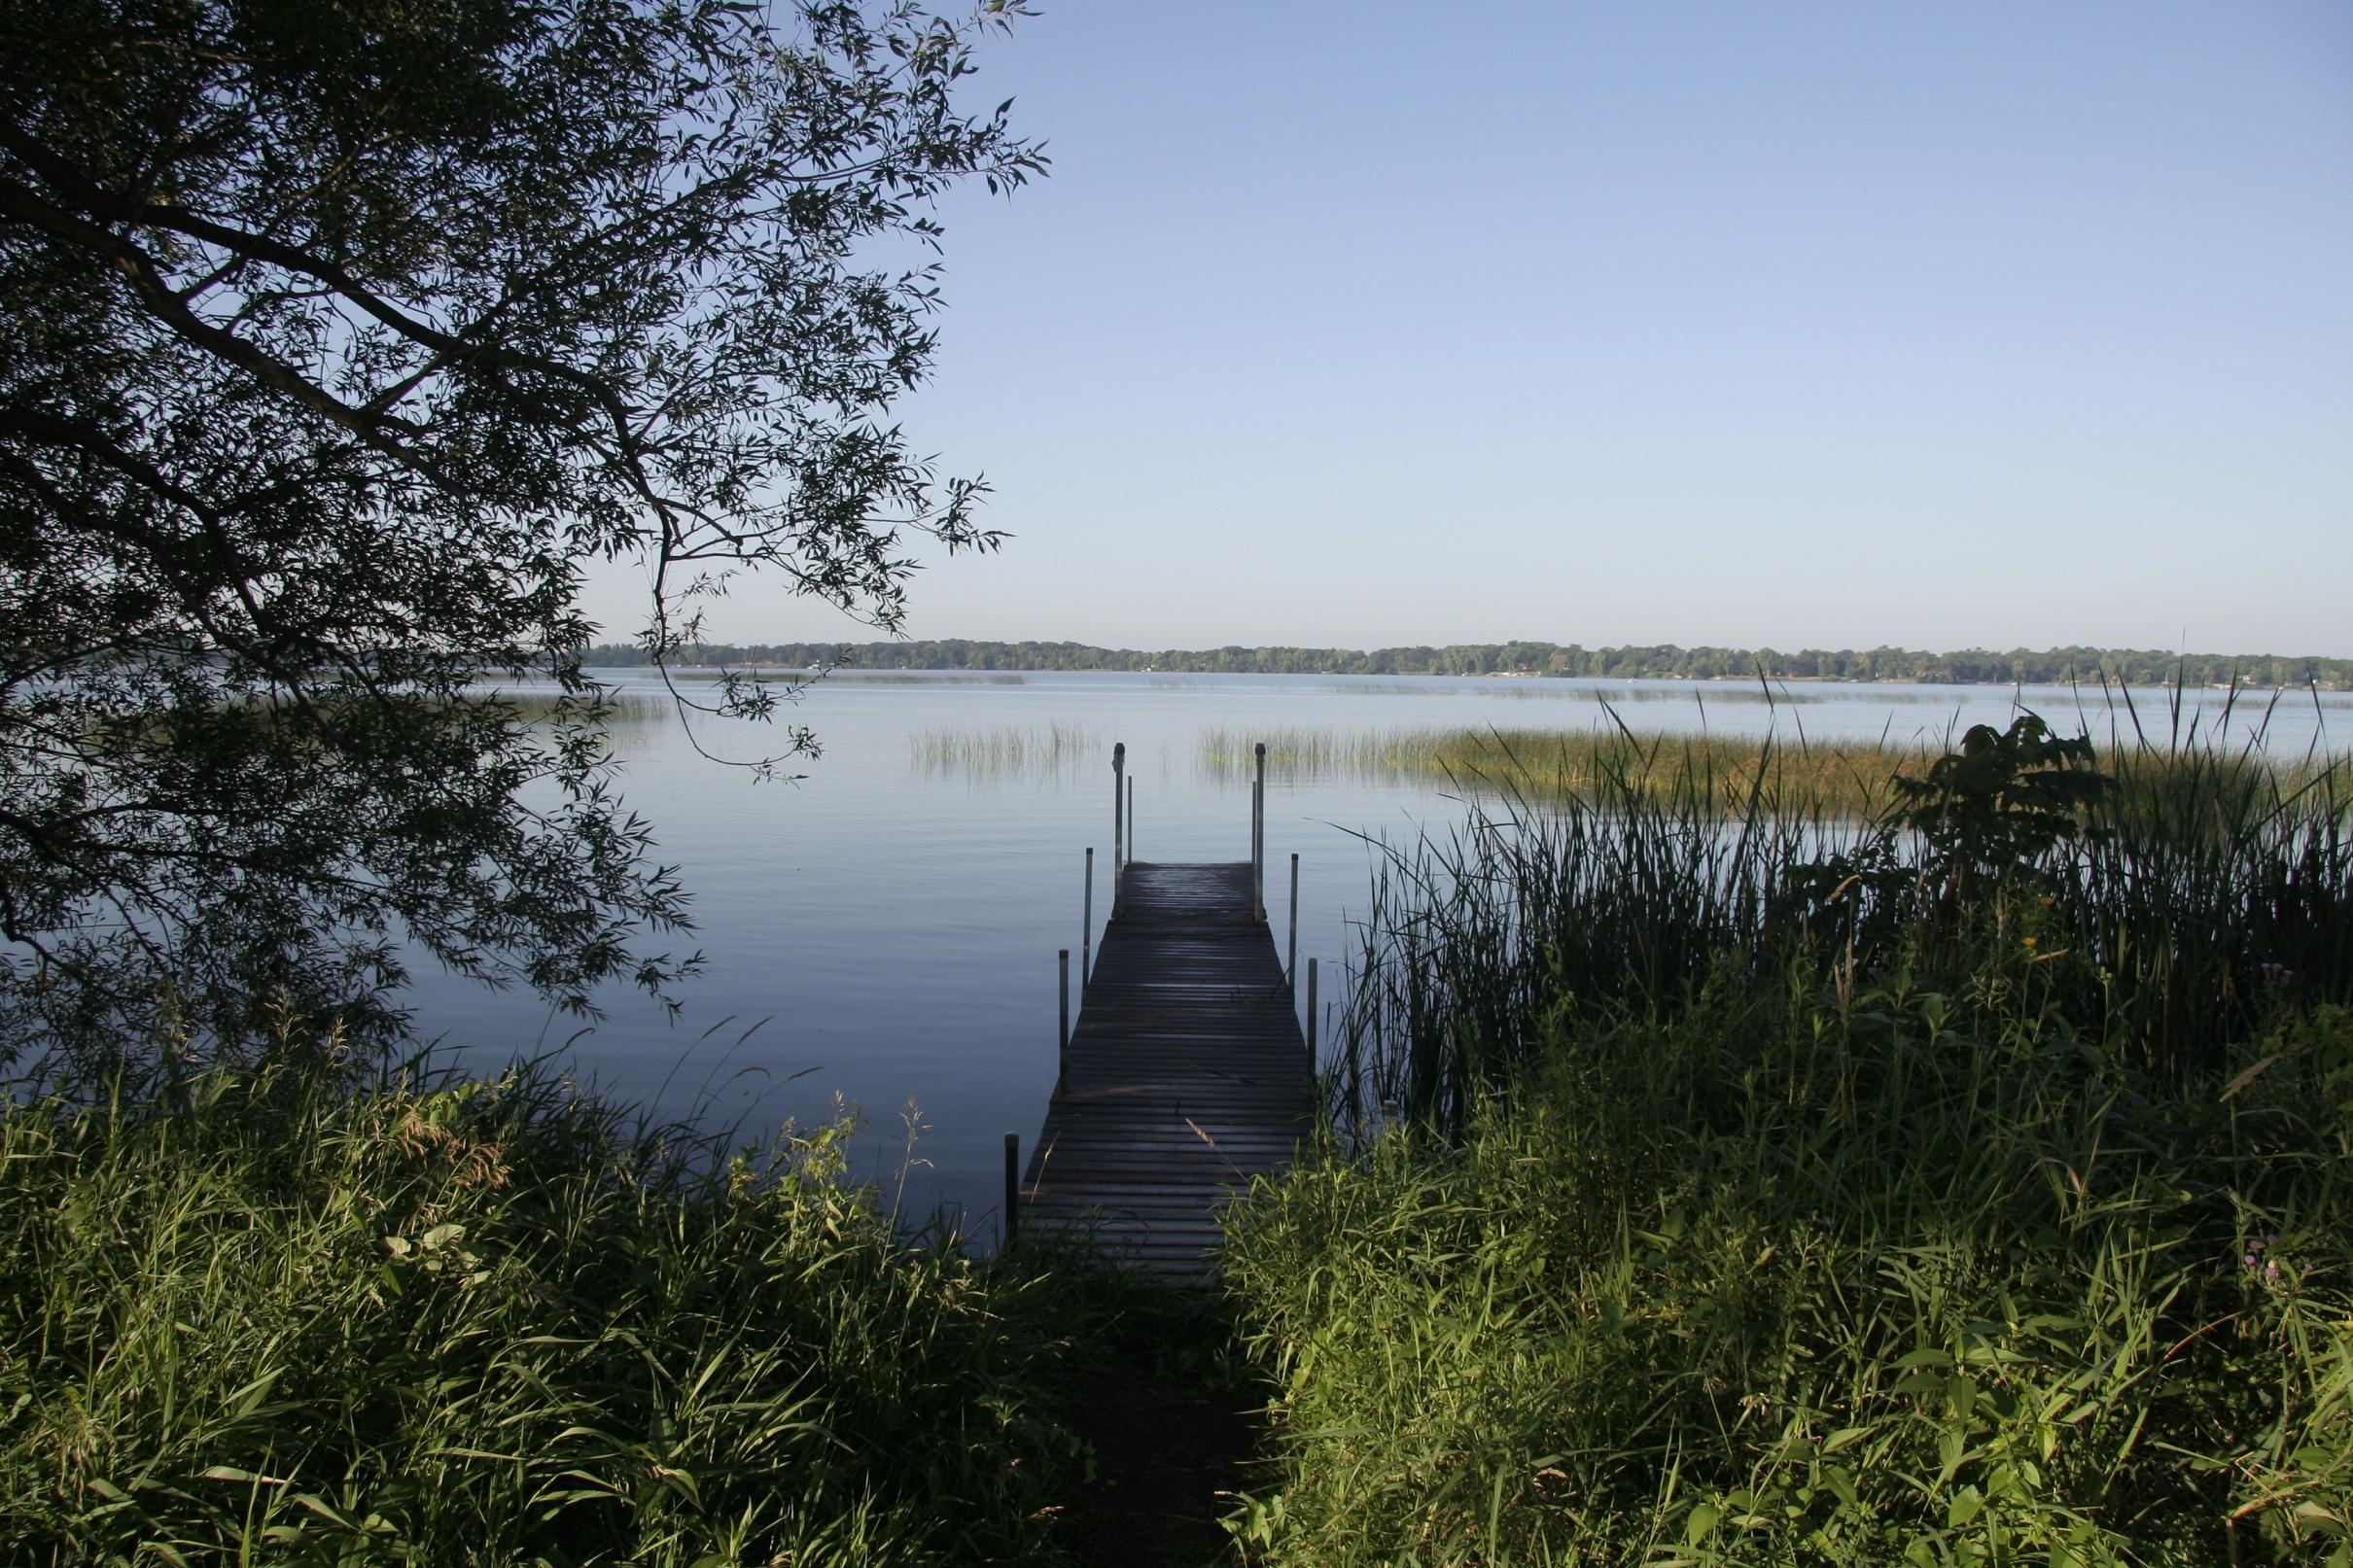 Lake in Minnesota